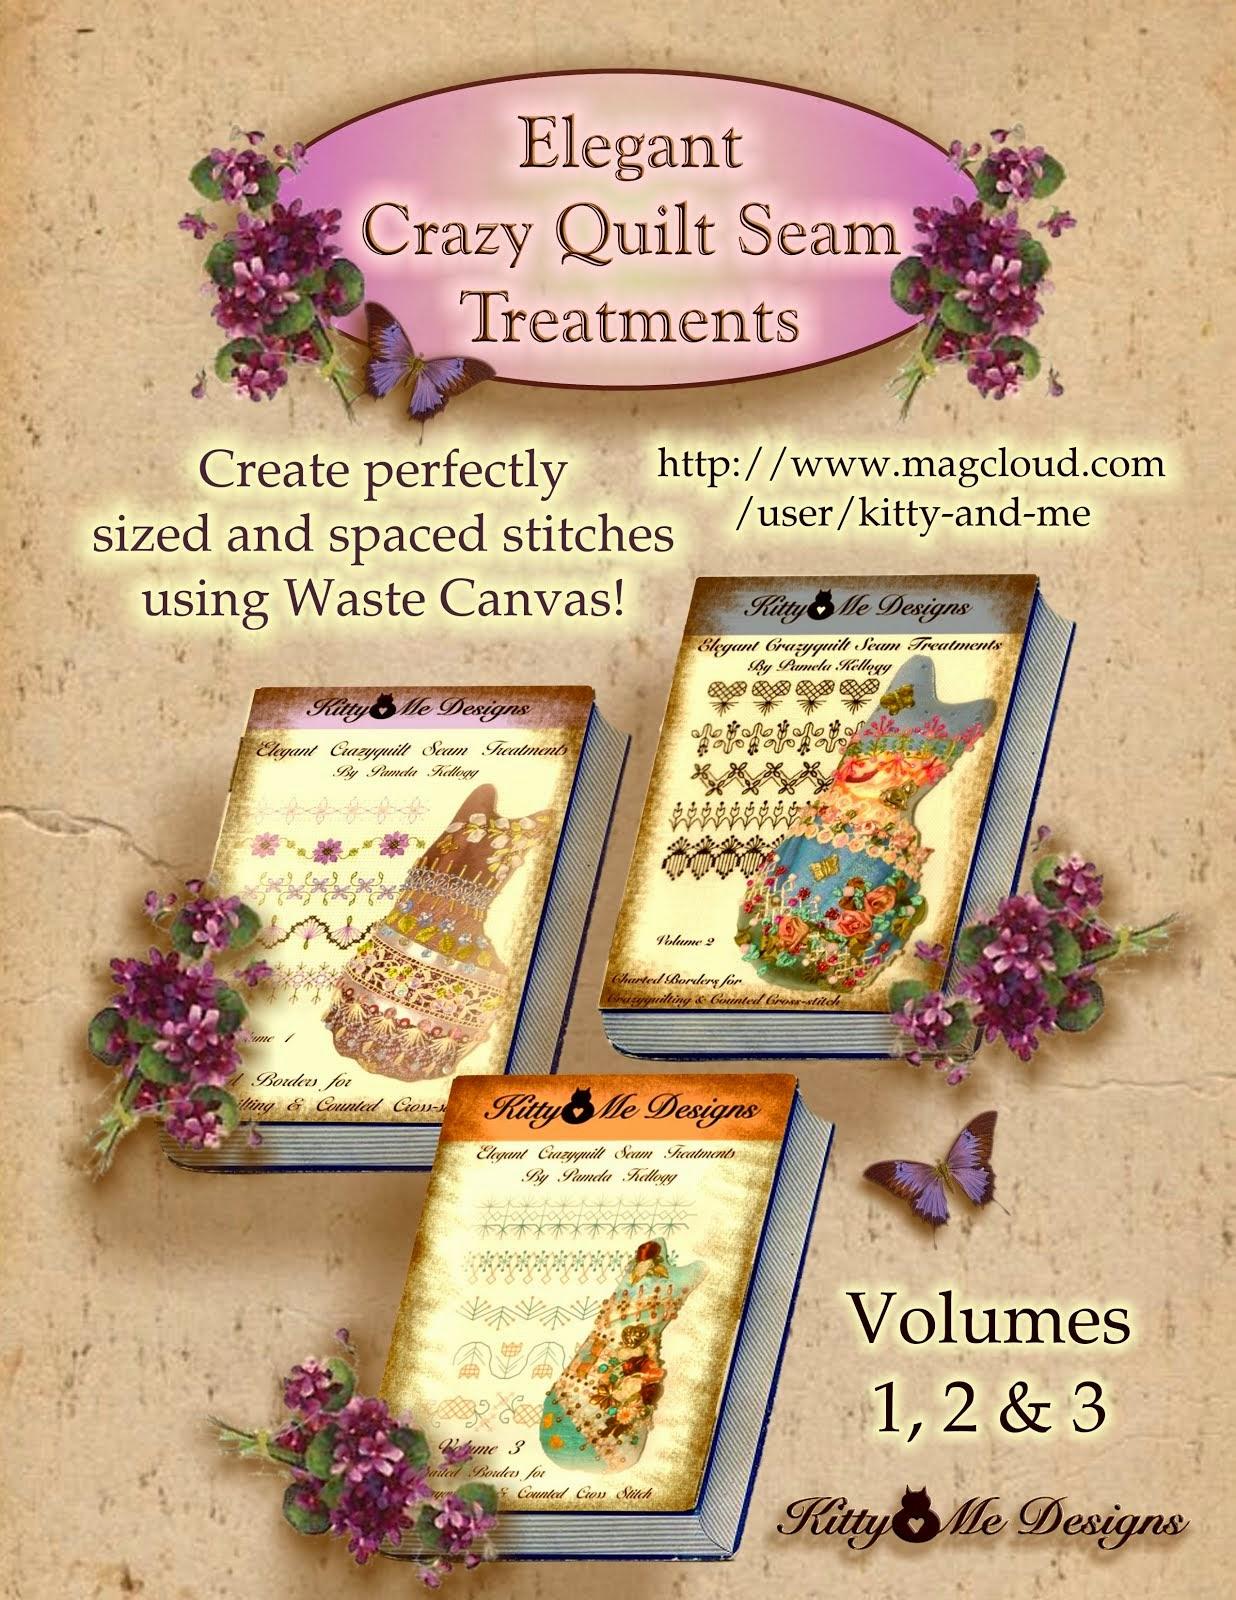 Elegant Crazy Quilt Seam Treatments